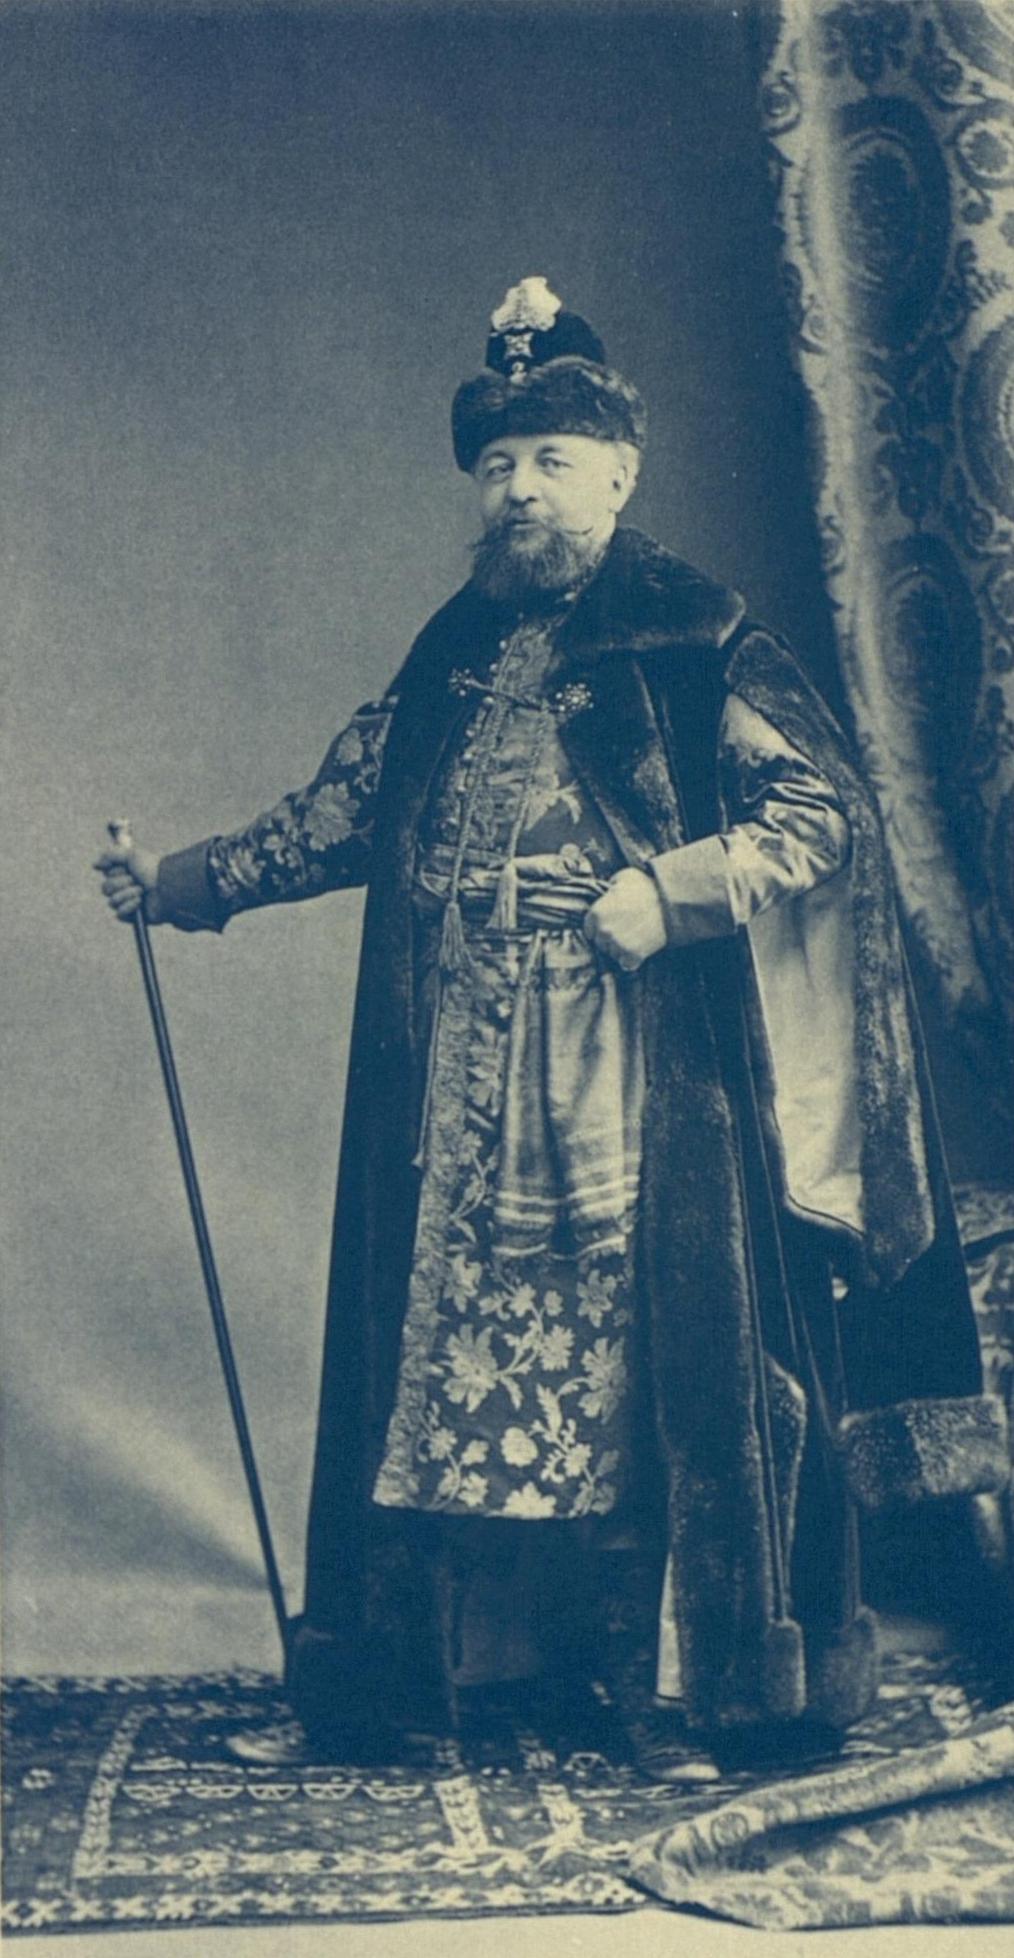 File:Prince Alexander D. Obolensky at 1903 ball.jpeg